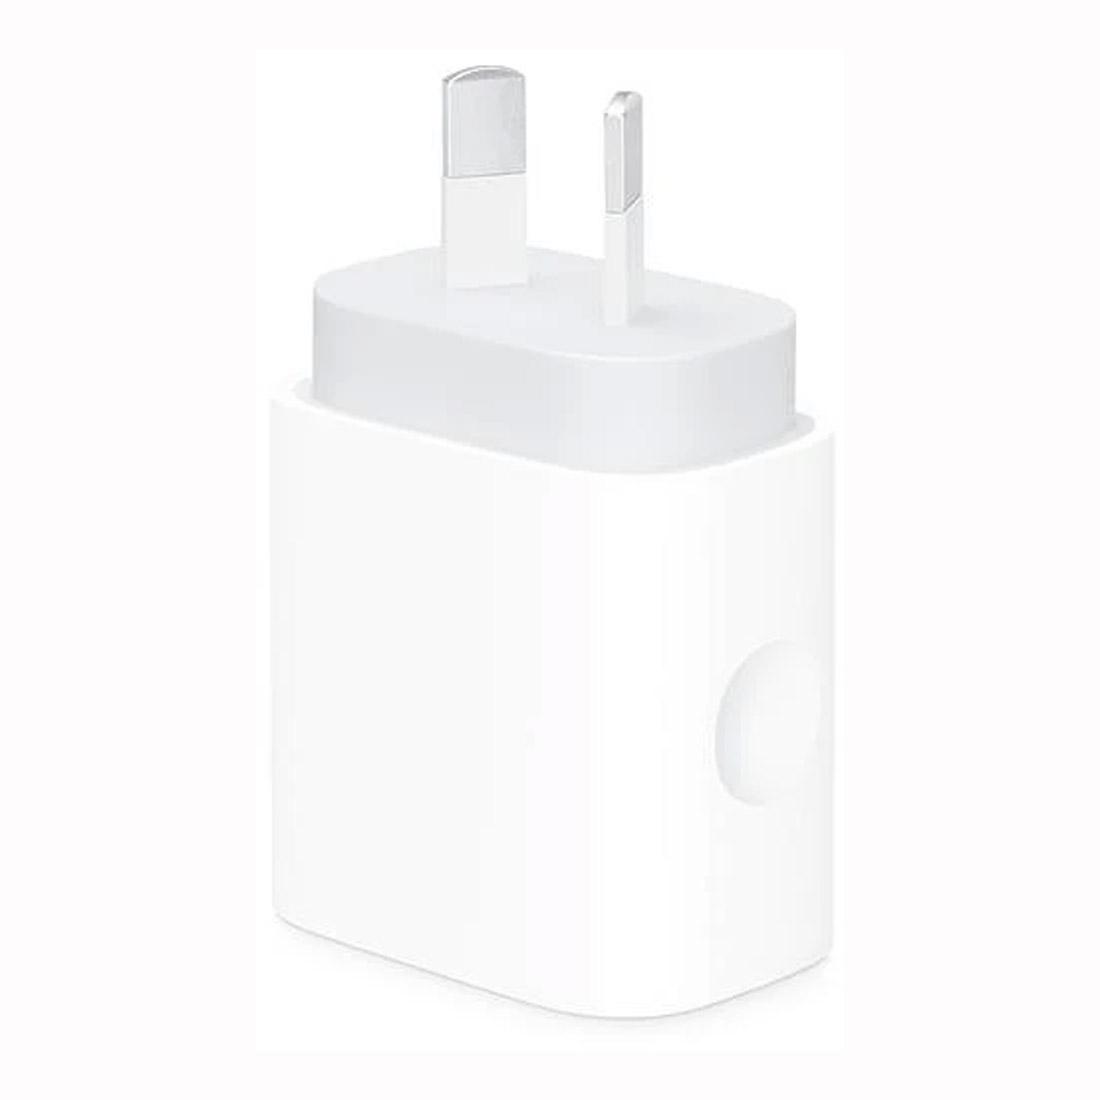 Apple 18W USB-C Power Adapter MU7X2X/A - White